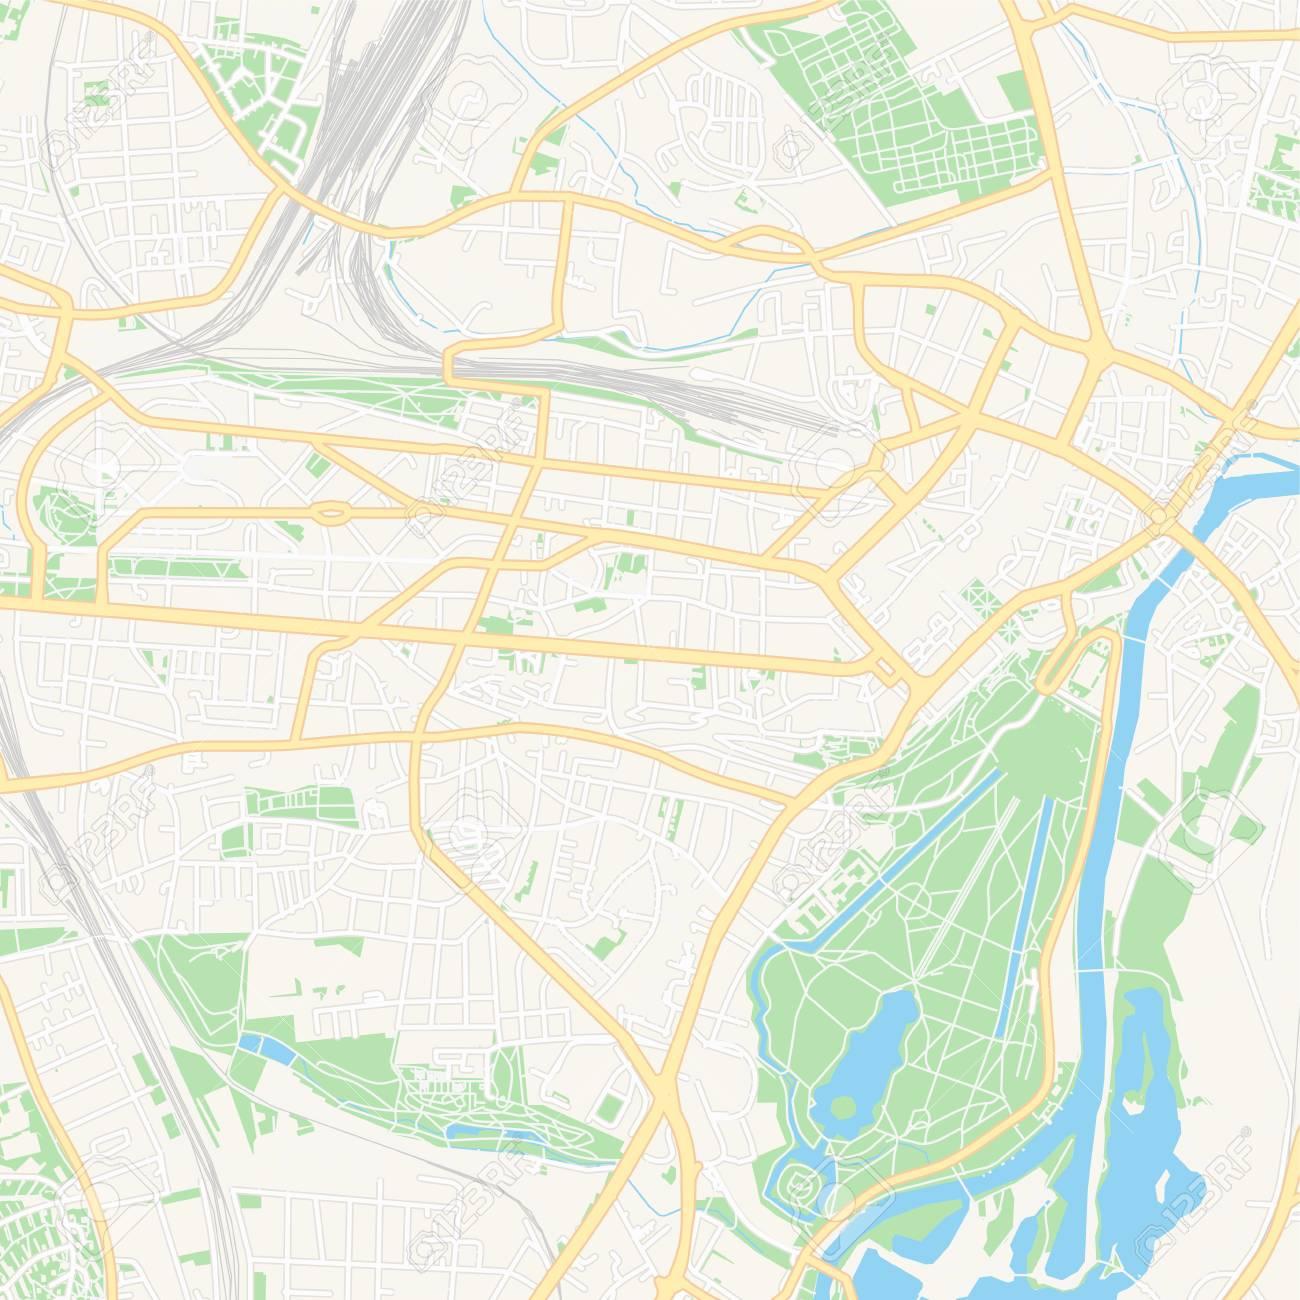 image regarding Printable Map of Germany named Printable map of Kel, Germany with principal and secondary roadways..